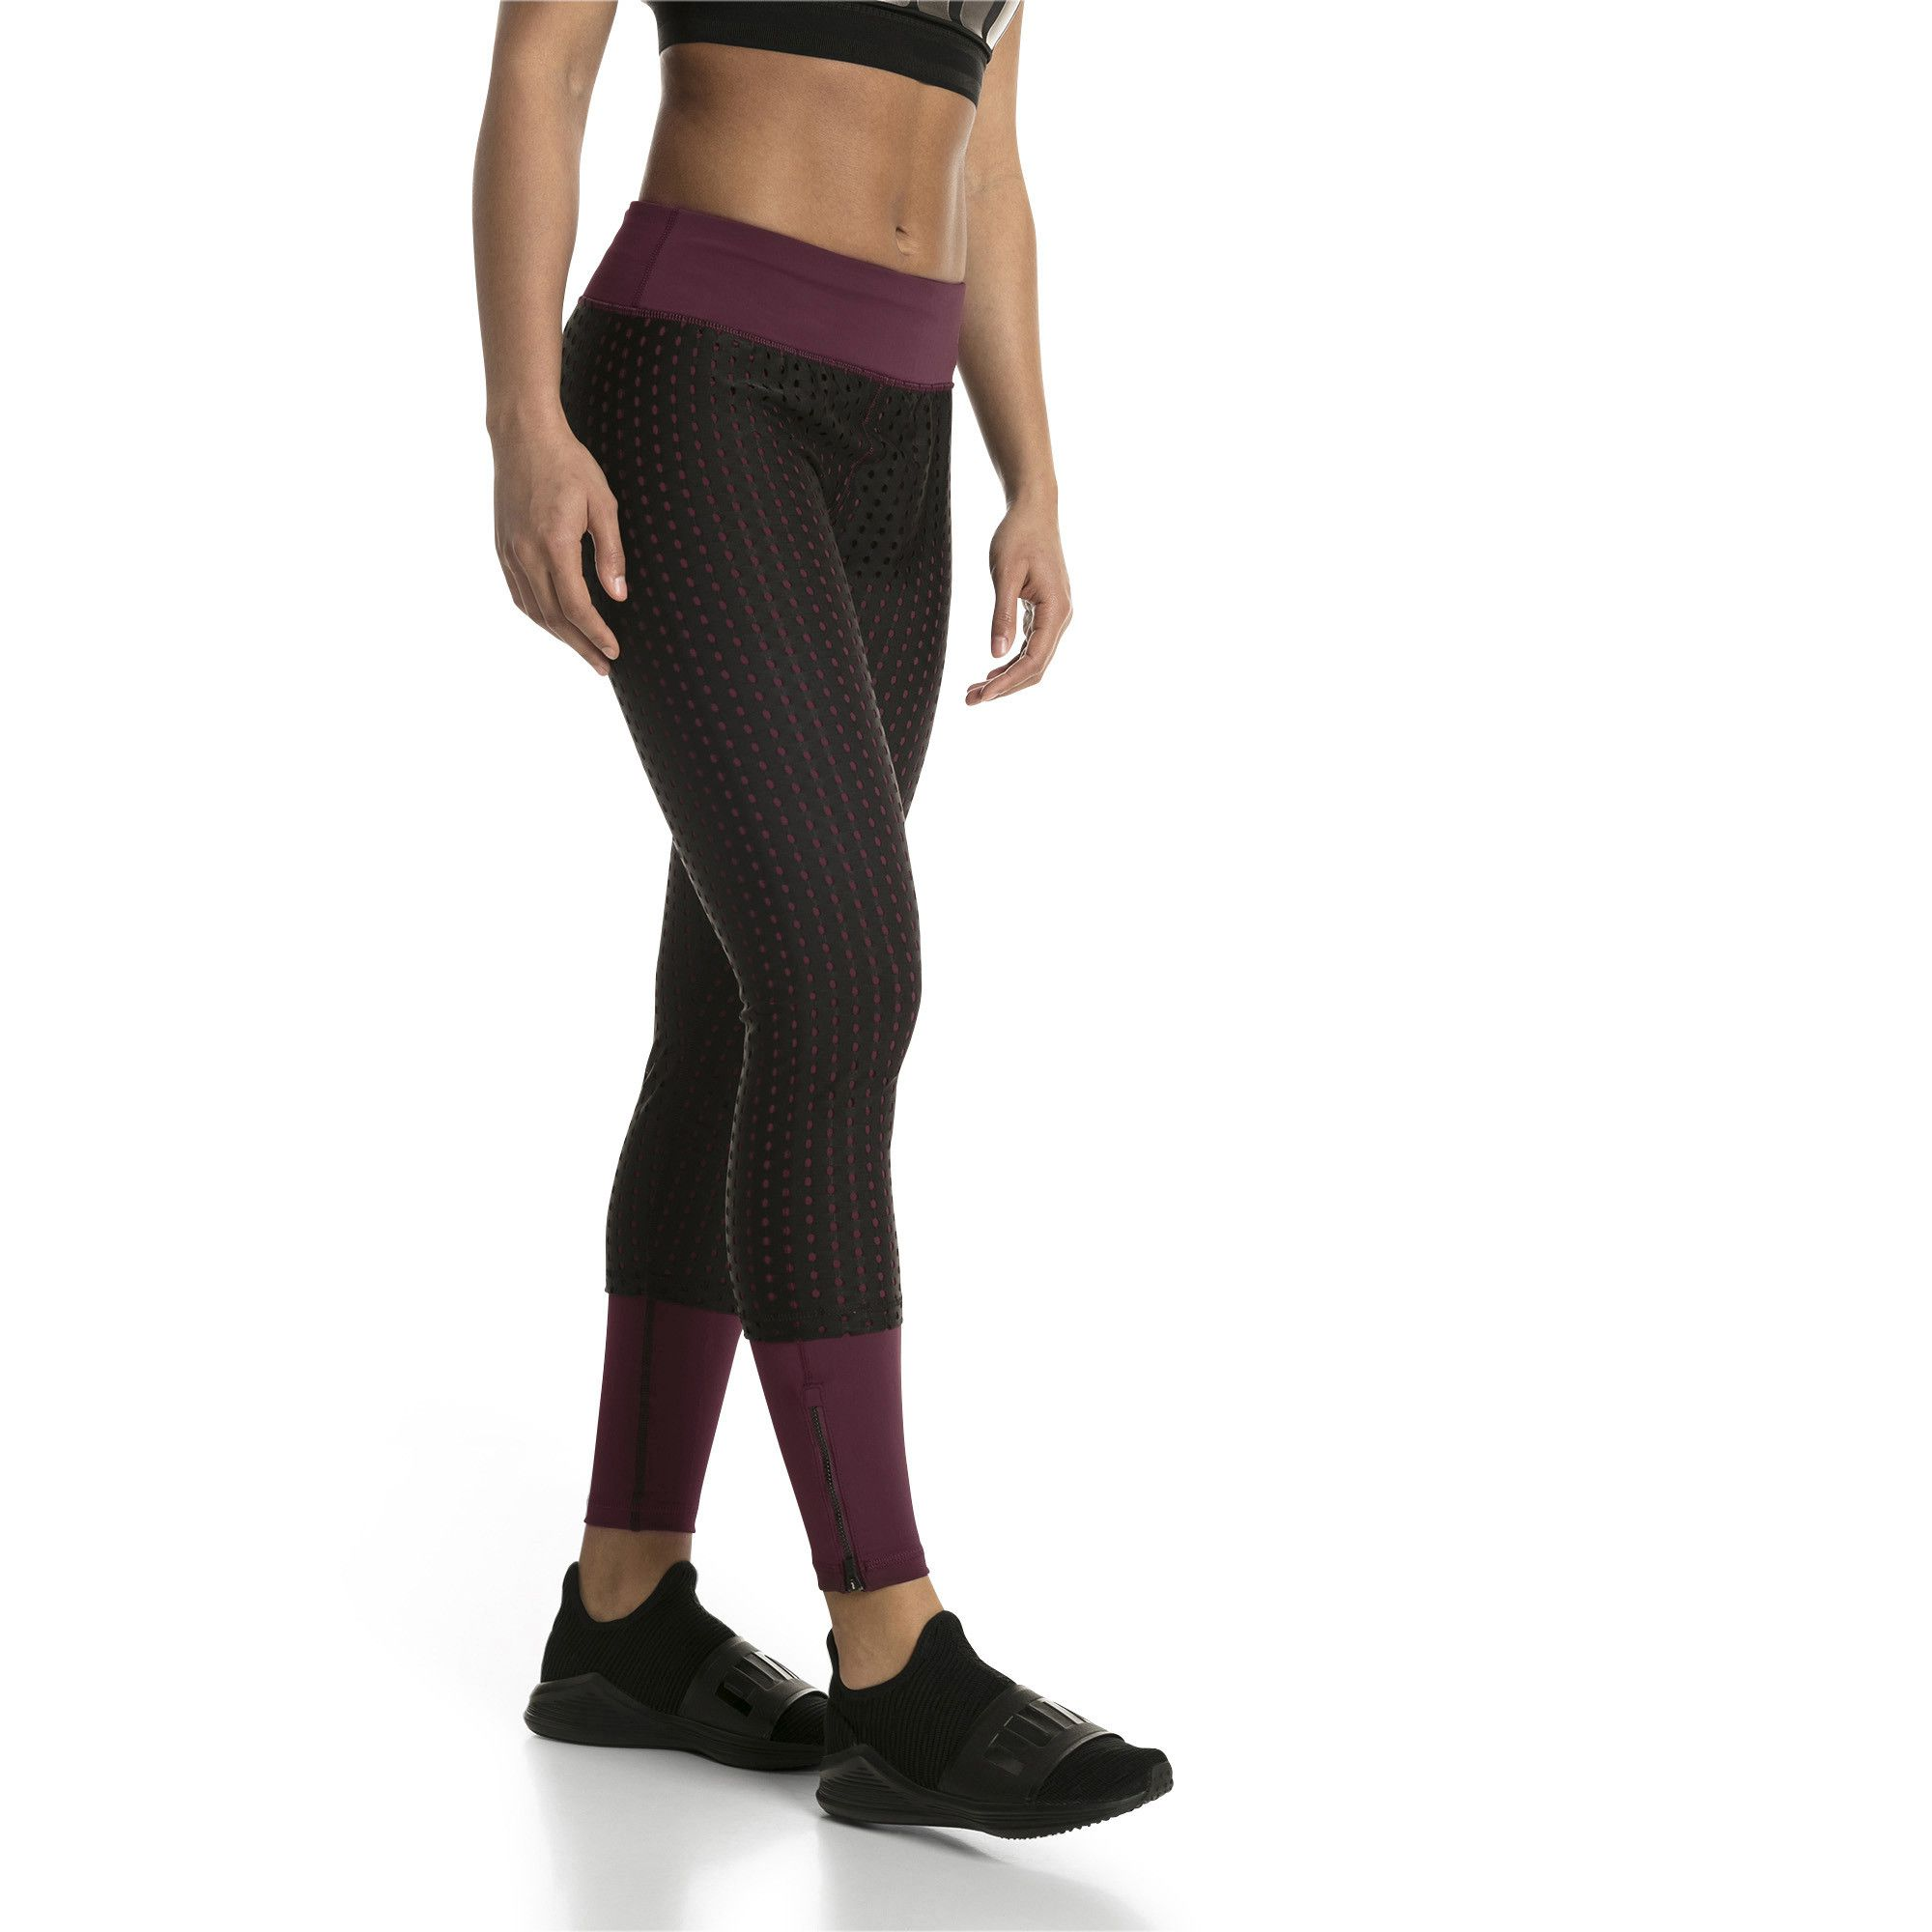 Calça legging Puma luxe mesh tight - Original